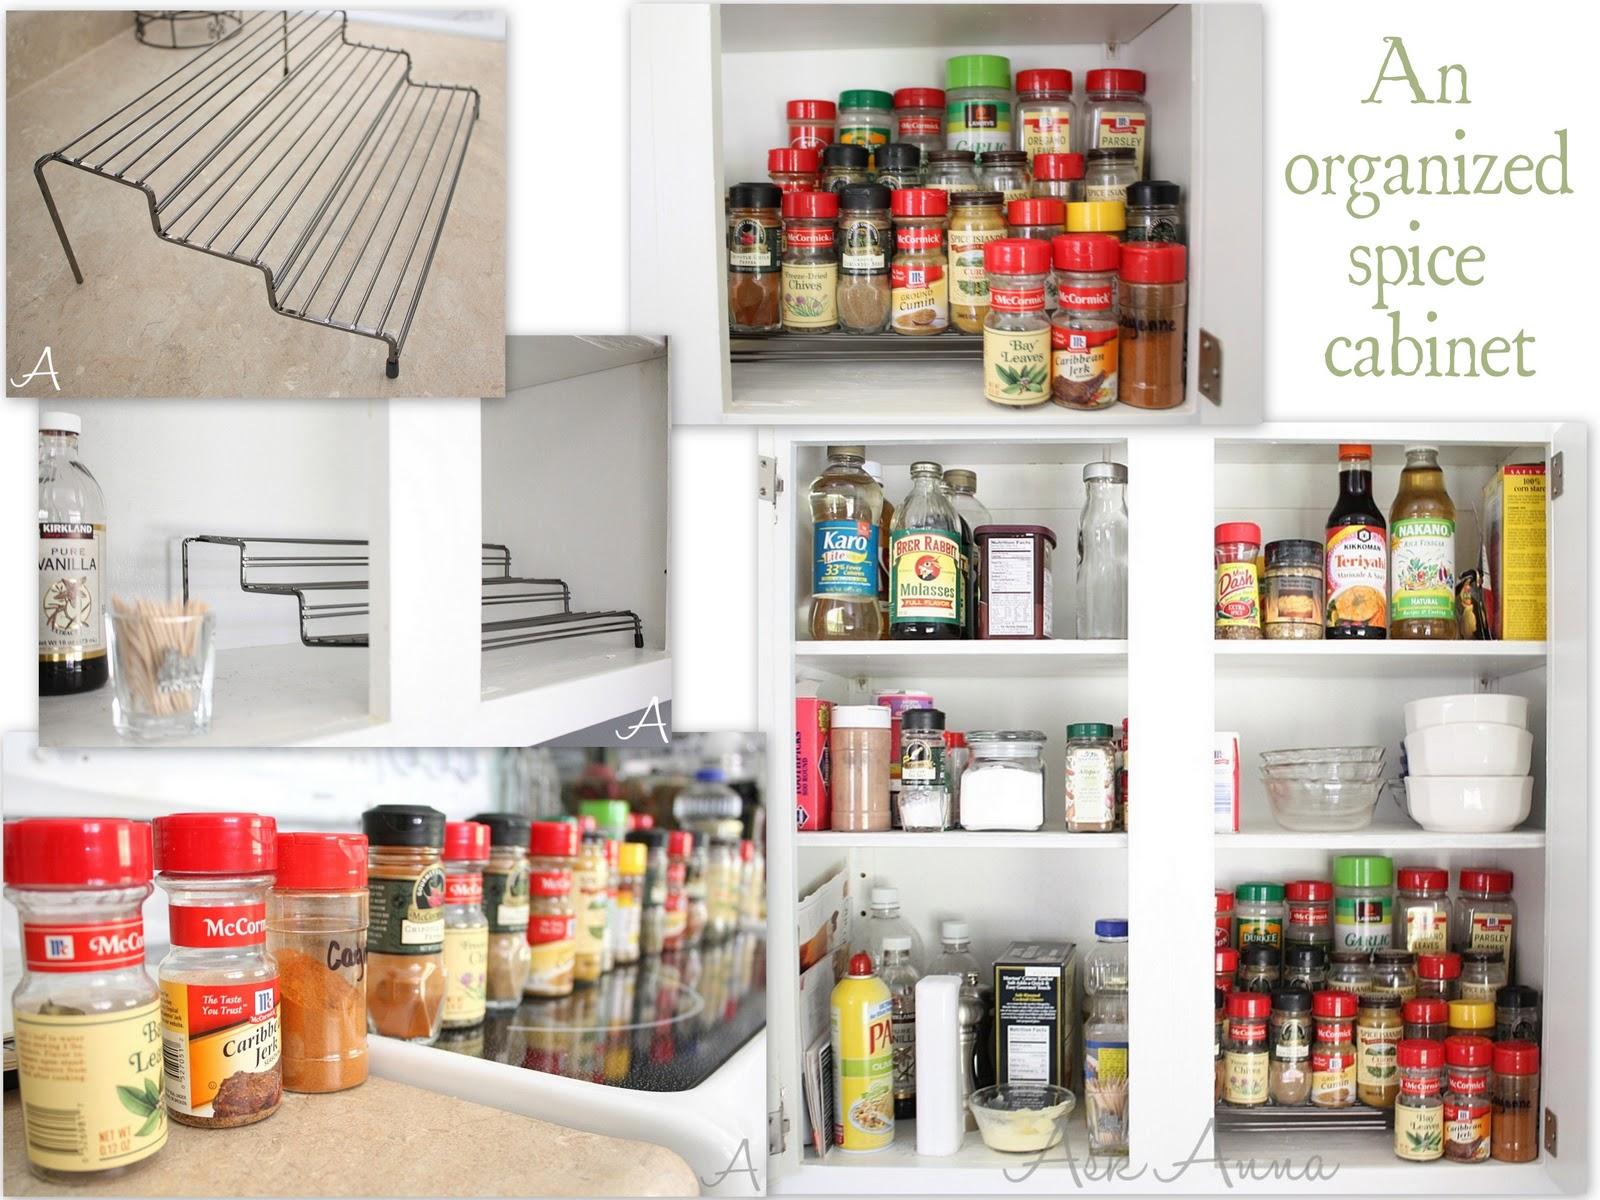 Day #6: Organizing Kitchen Cabinets